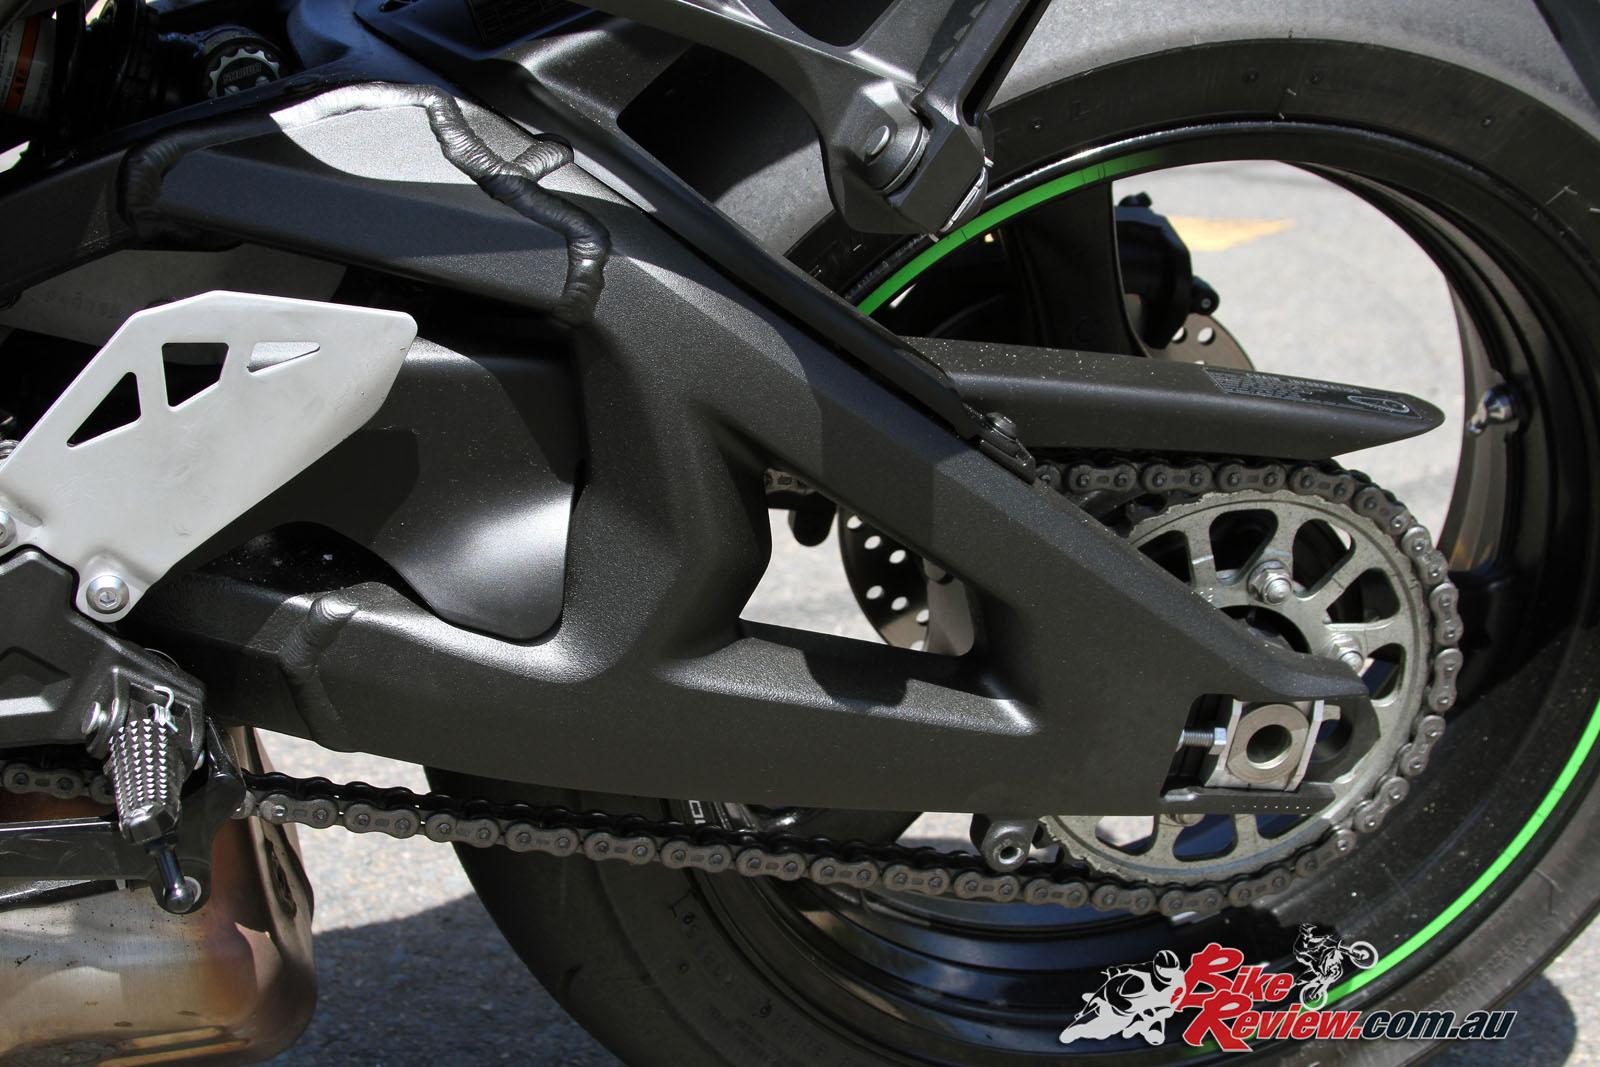 Review: 2016 Kawasaki Ninja ZX-10R Road Test - Bike Review